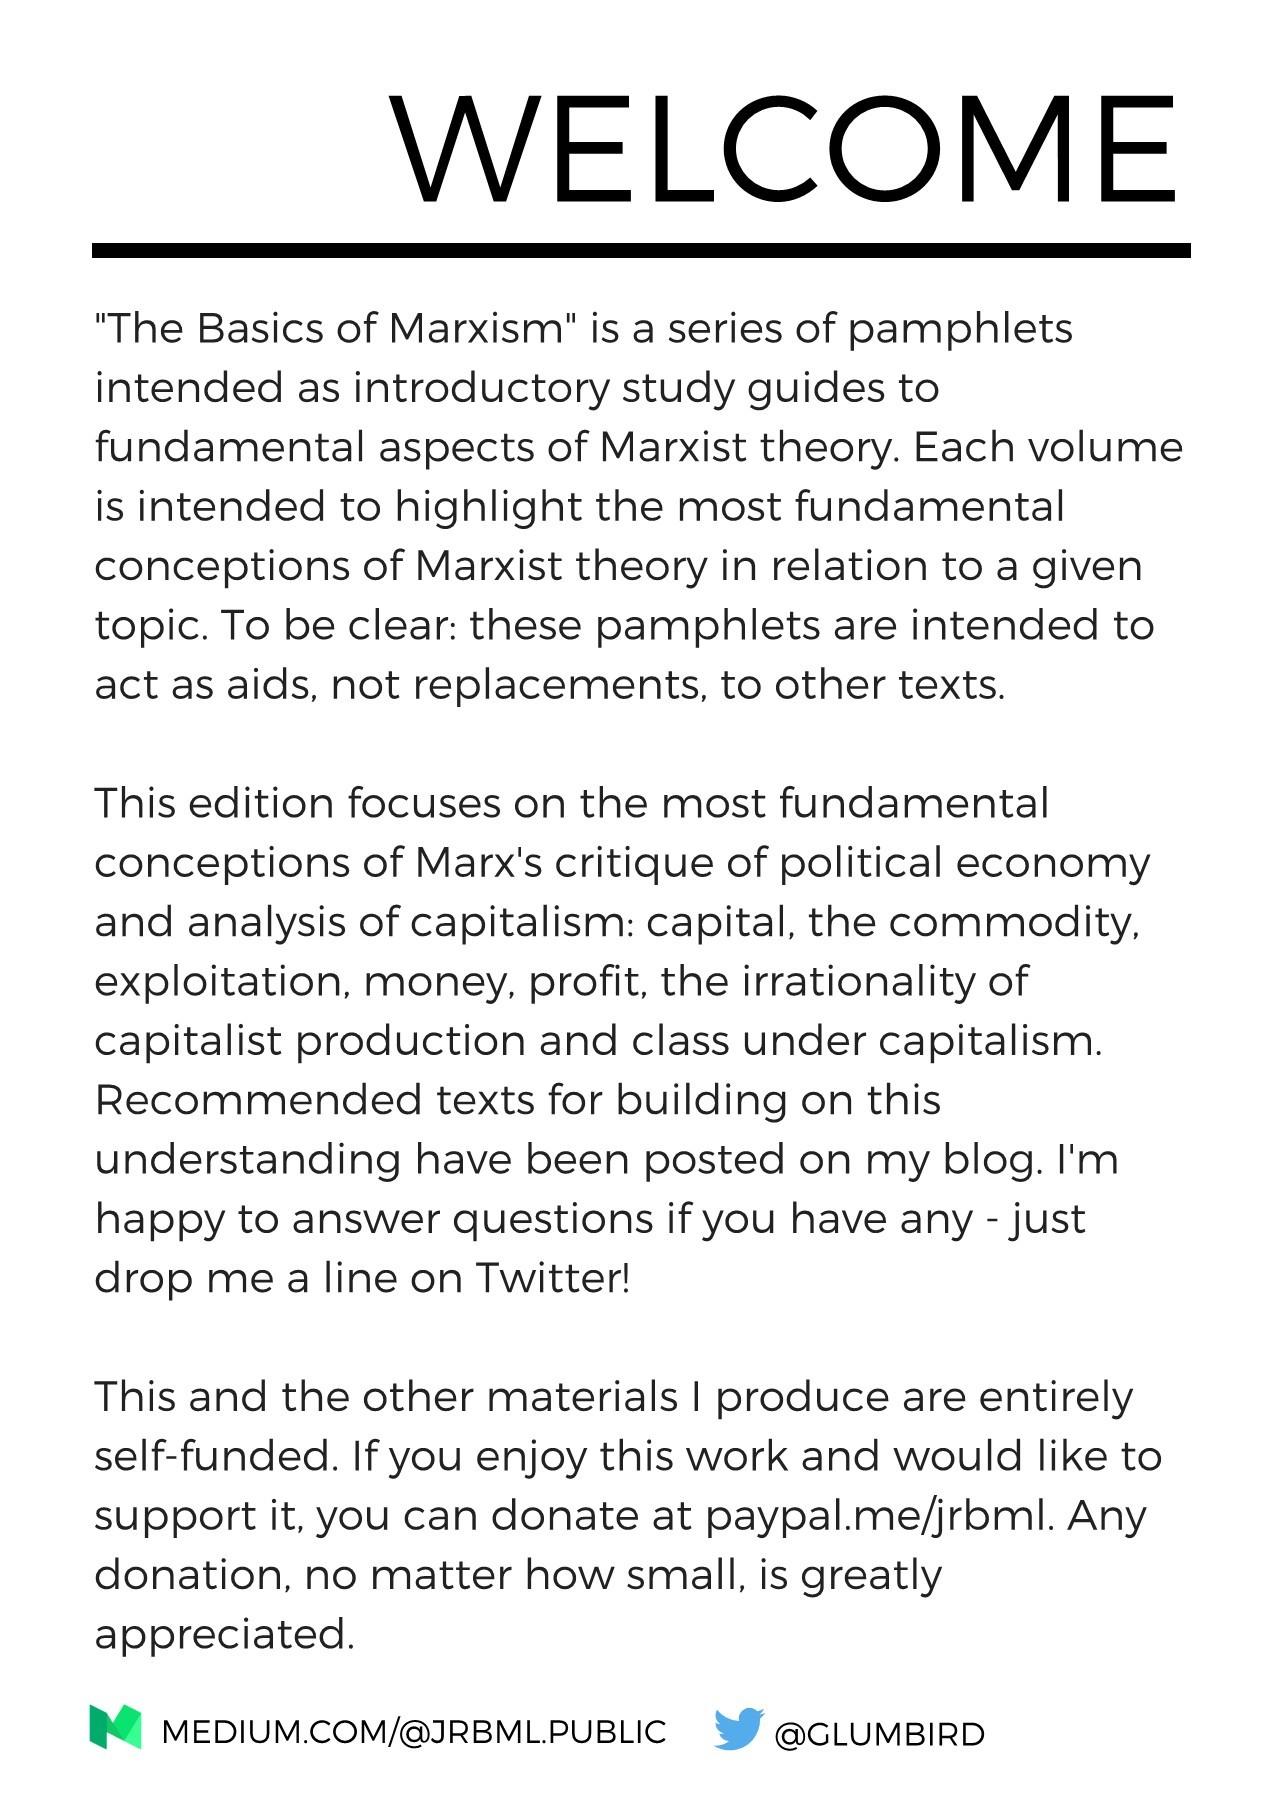 karl marx theory of capitalism